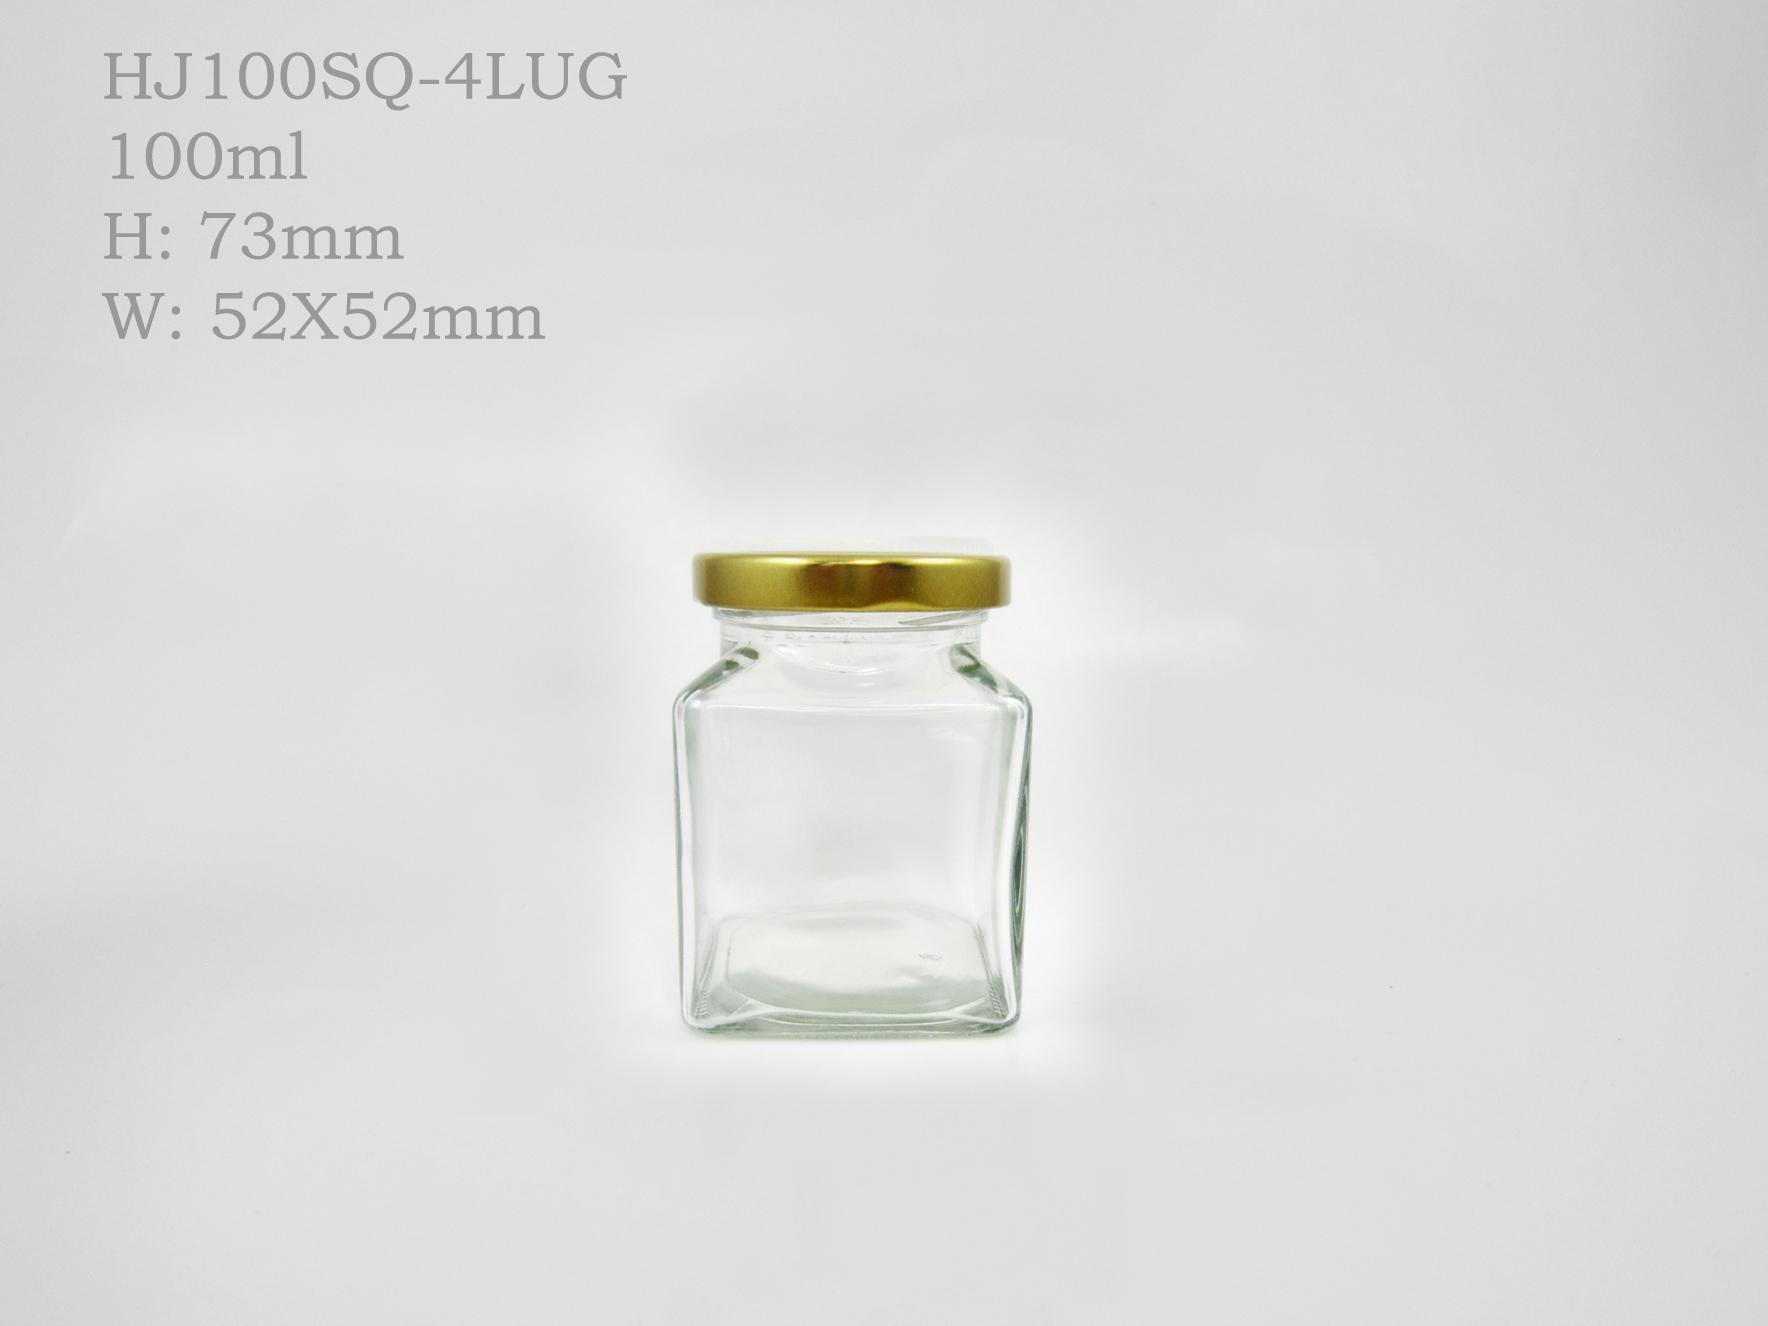 hj100sq-4lug_gold